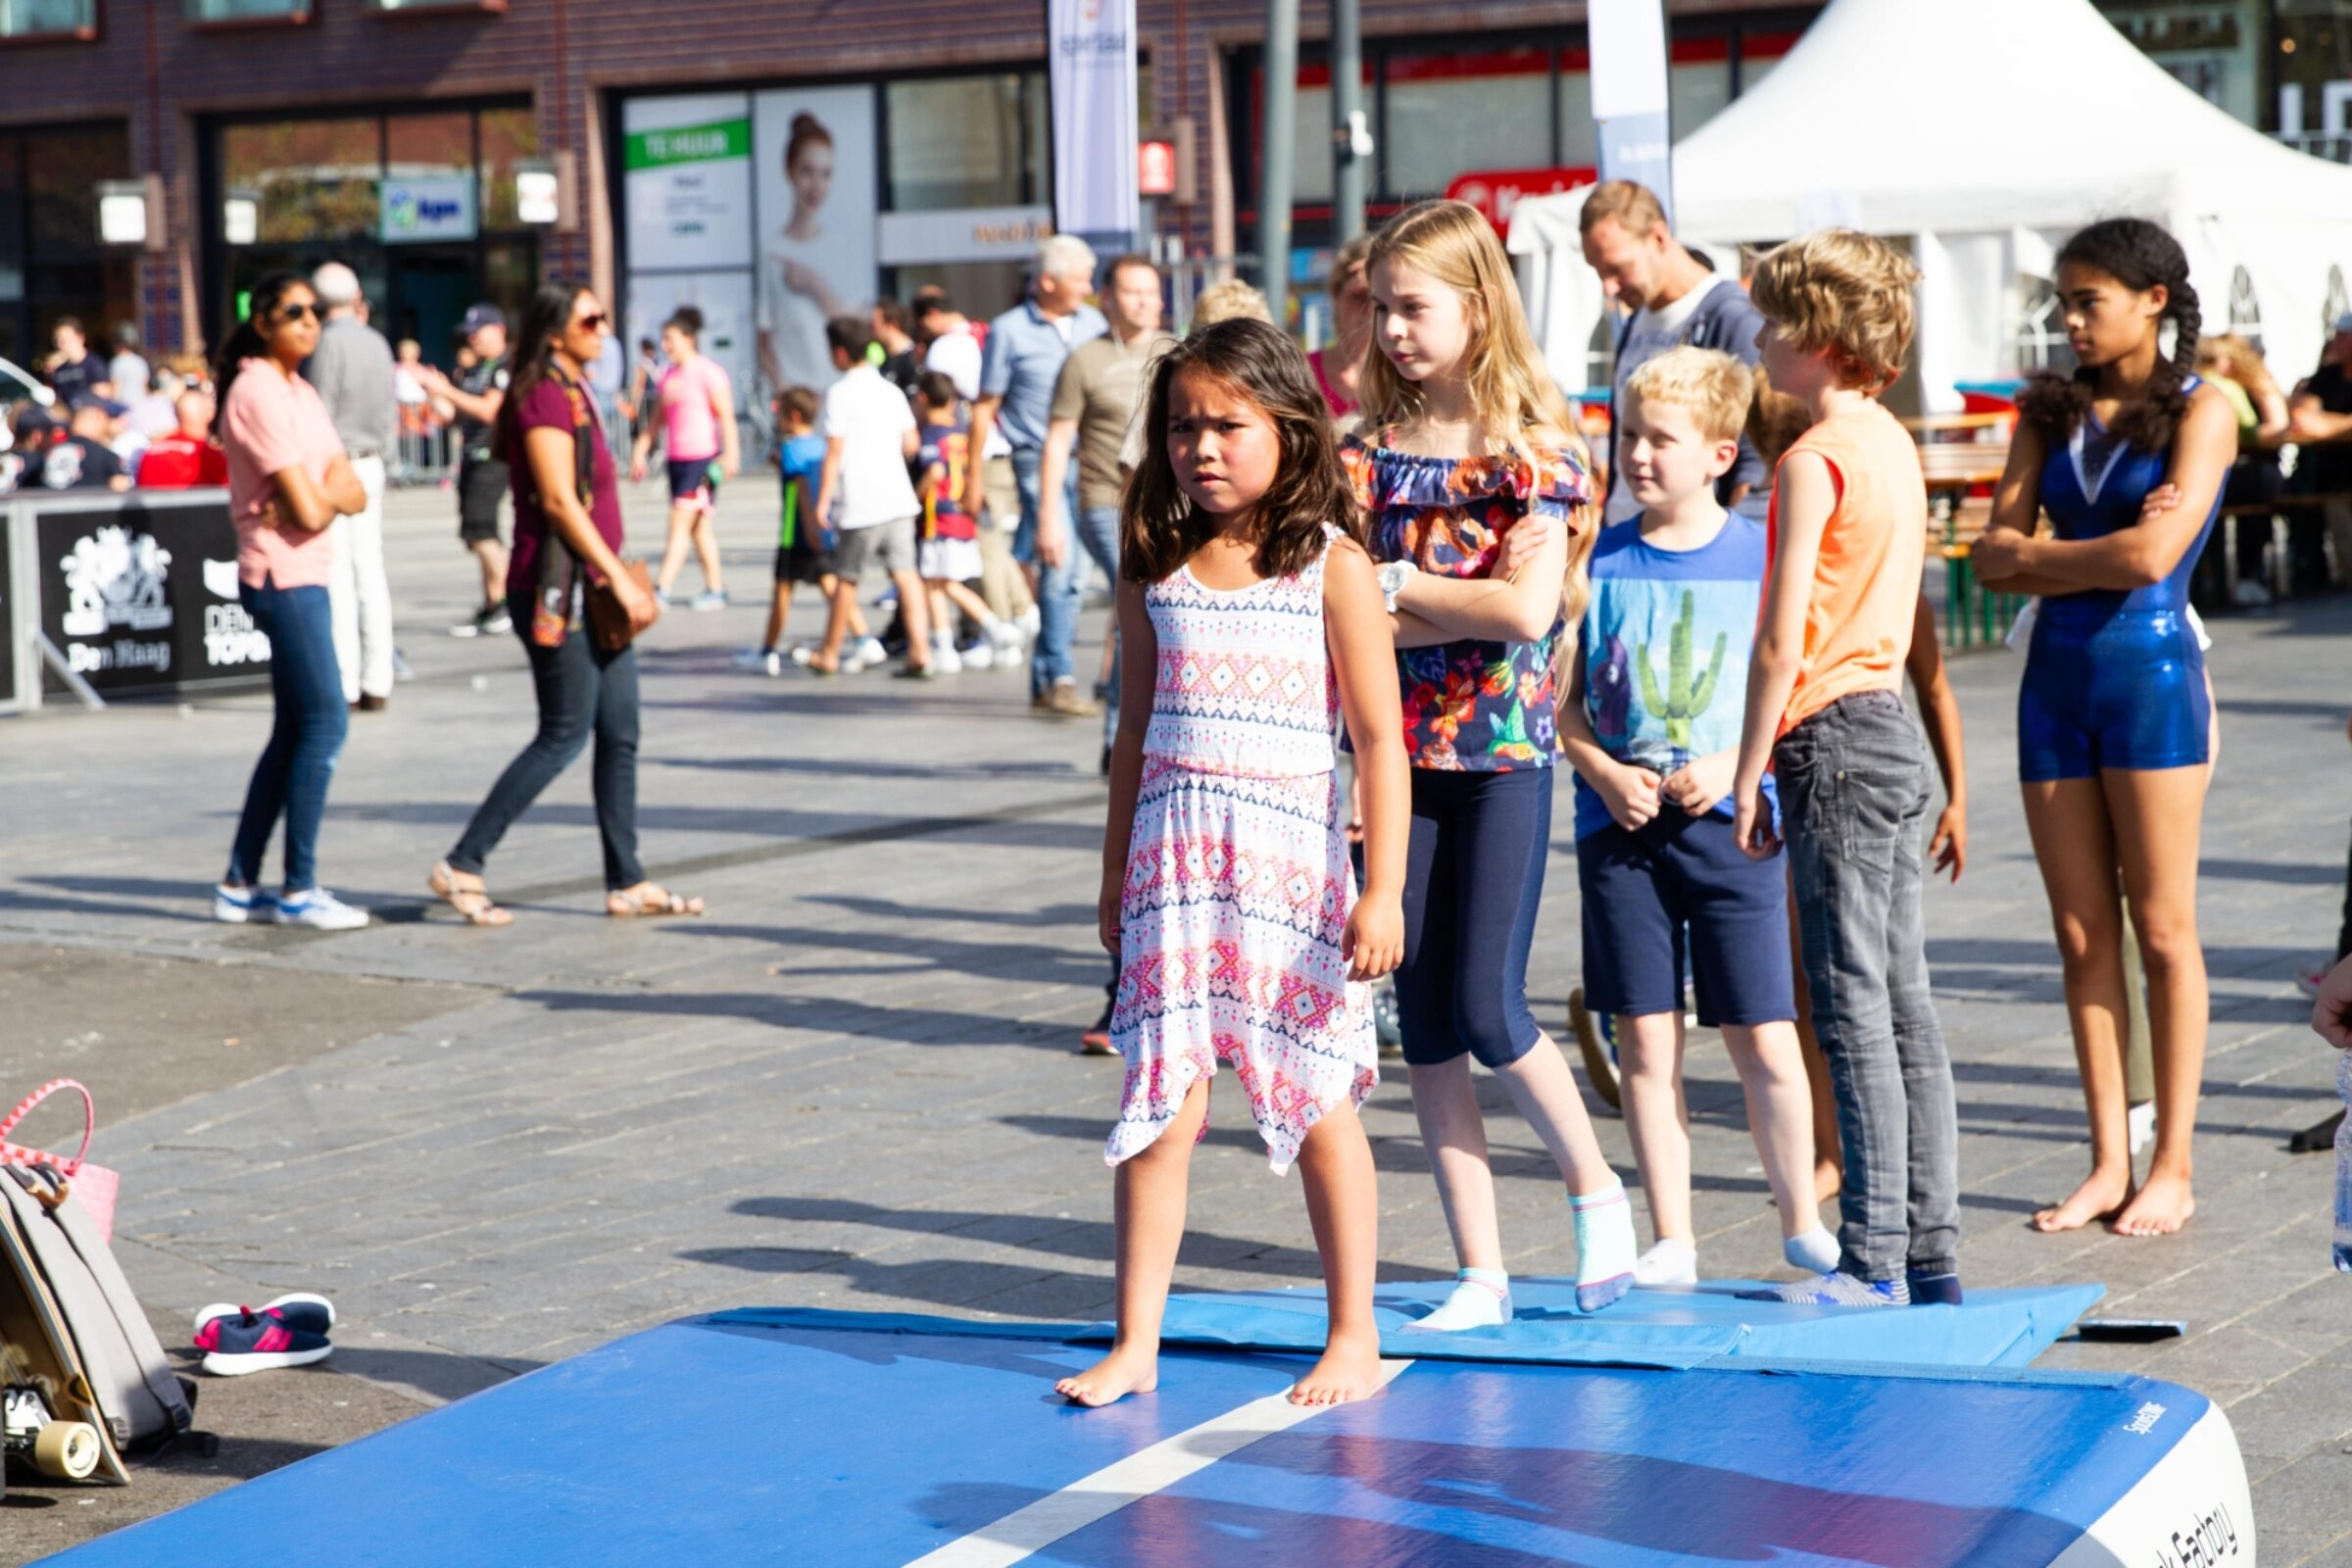 Dinsdagmarkt: Kidsday